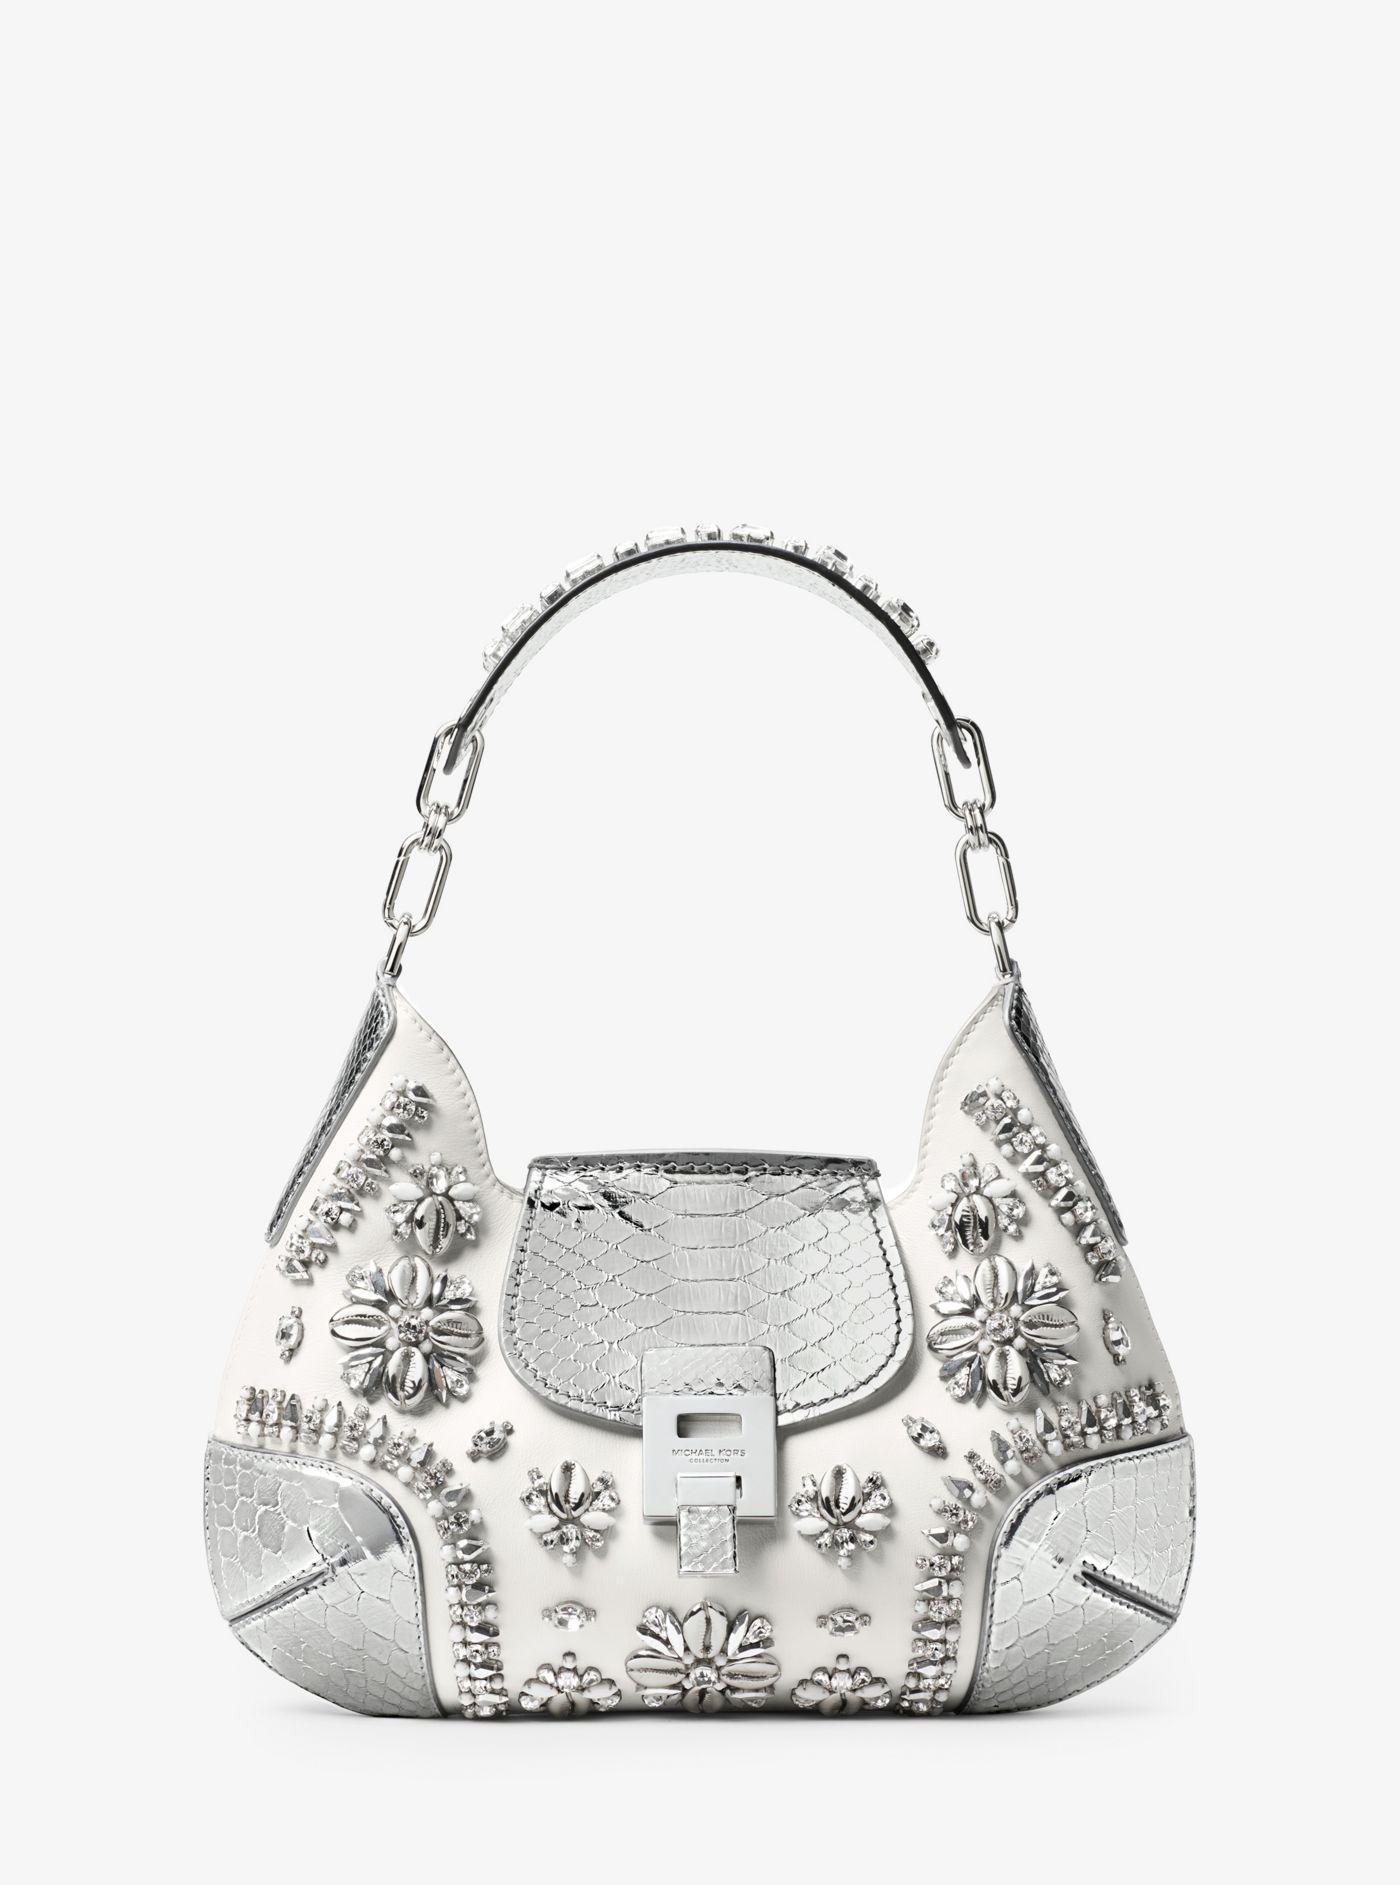 fc5661f3bd4a13 Michael Kors Bancroft Medium Embroidered Calf Leather Shoulder Bag ...